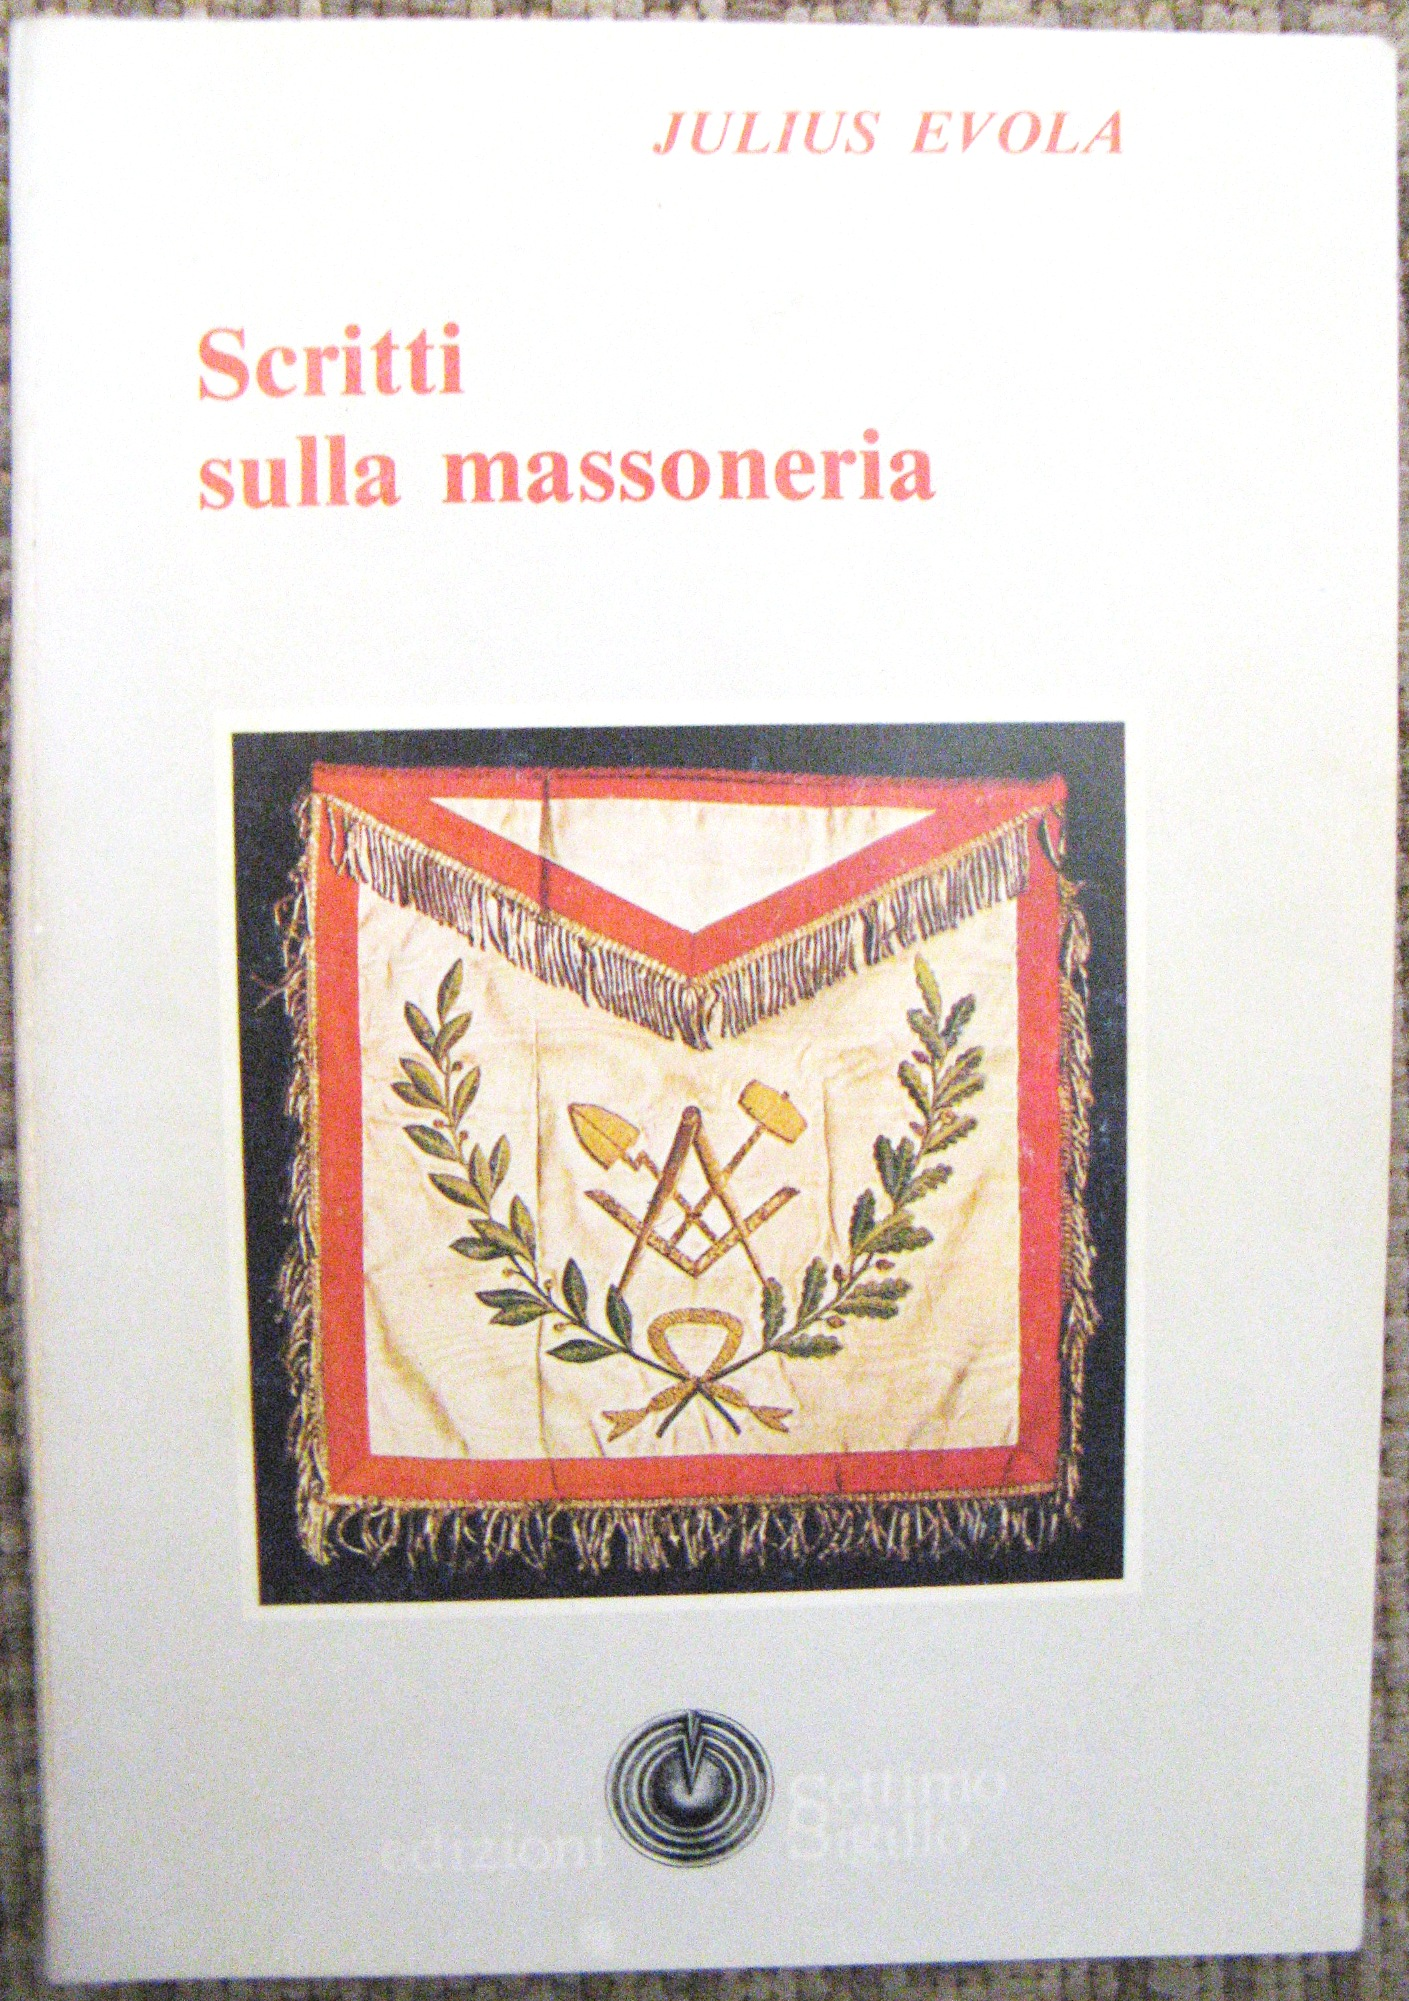 Resultado de imagen de julius evola scritti sulla masoneria